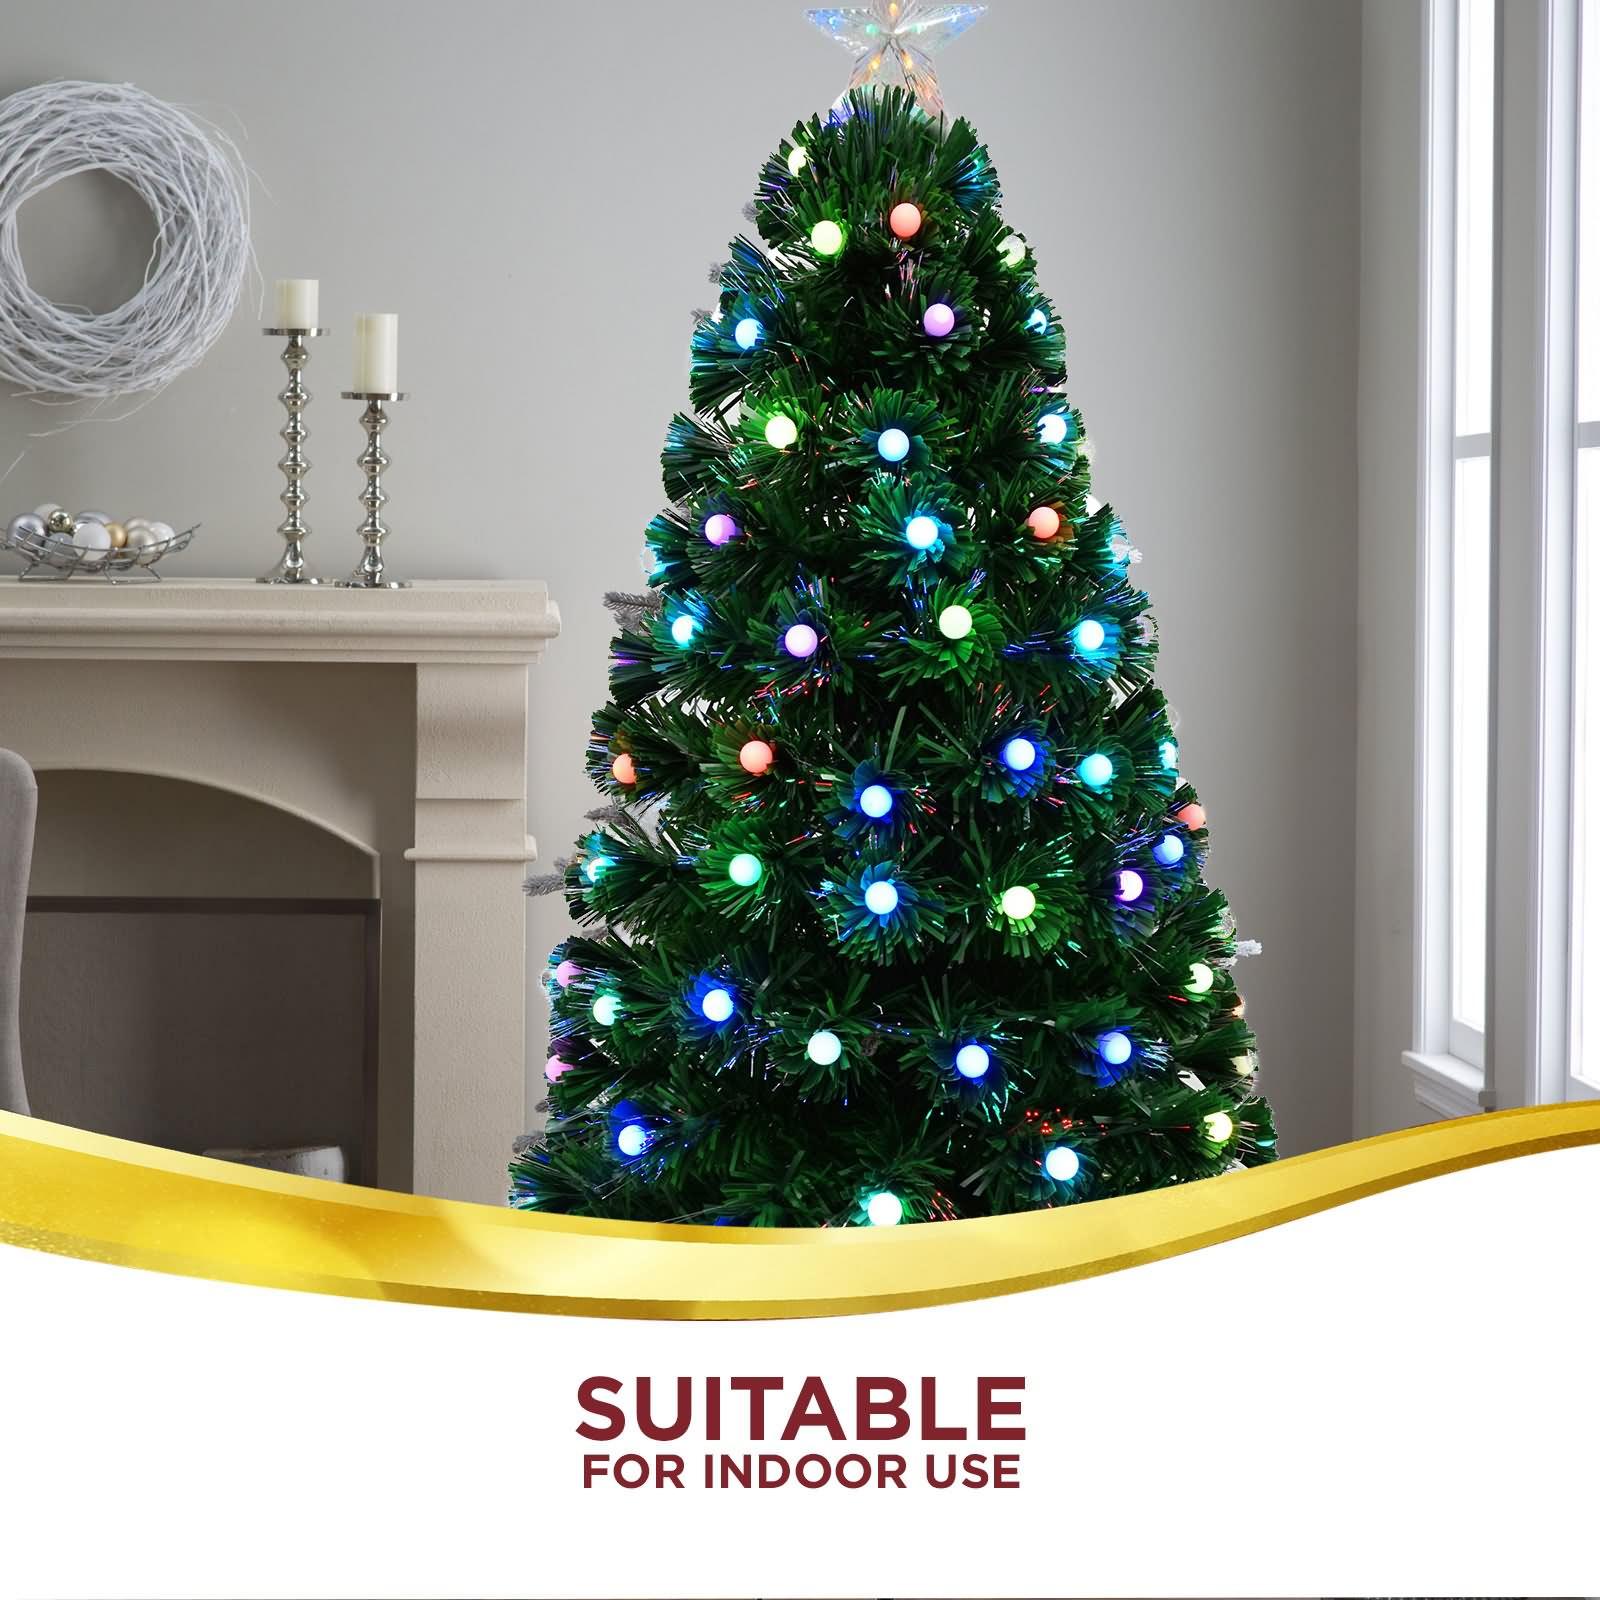 4ft Christmas Tree With Lights: 1.2m 4FT LED Green Christmas Tree Lights Multi Colour Xmas